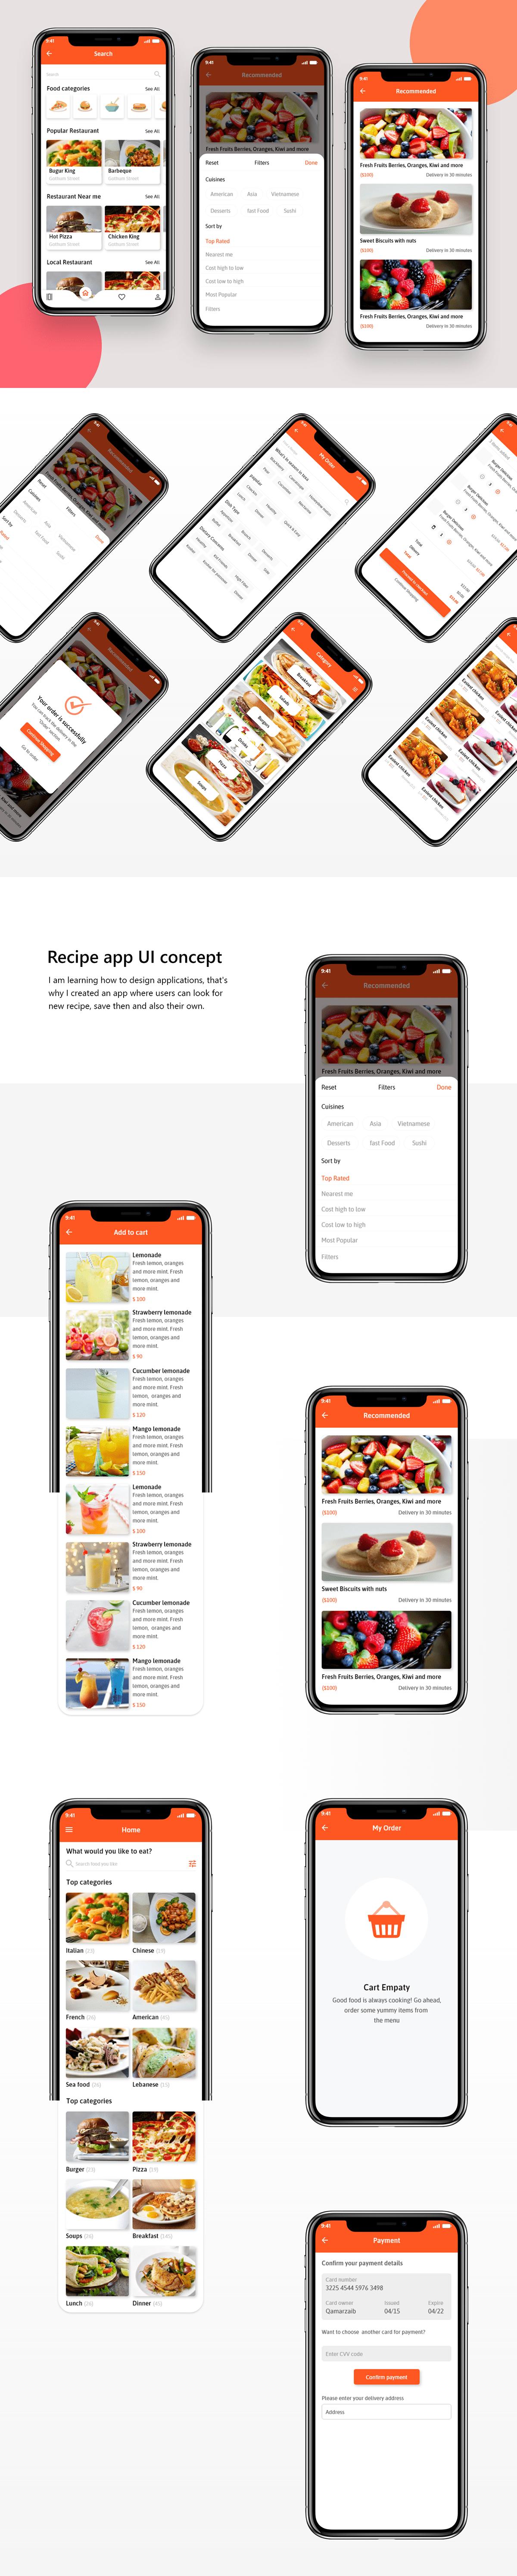 latest modern trending food delivery app uiux design 2021